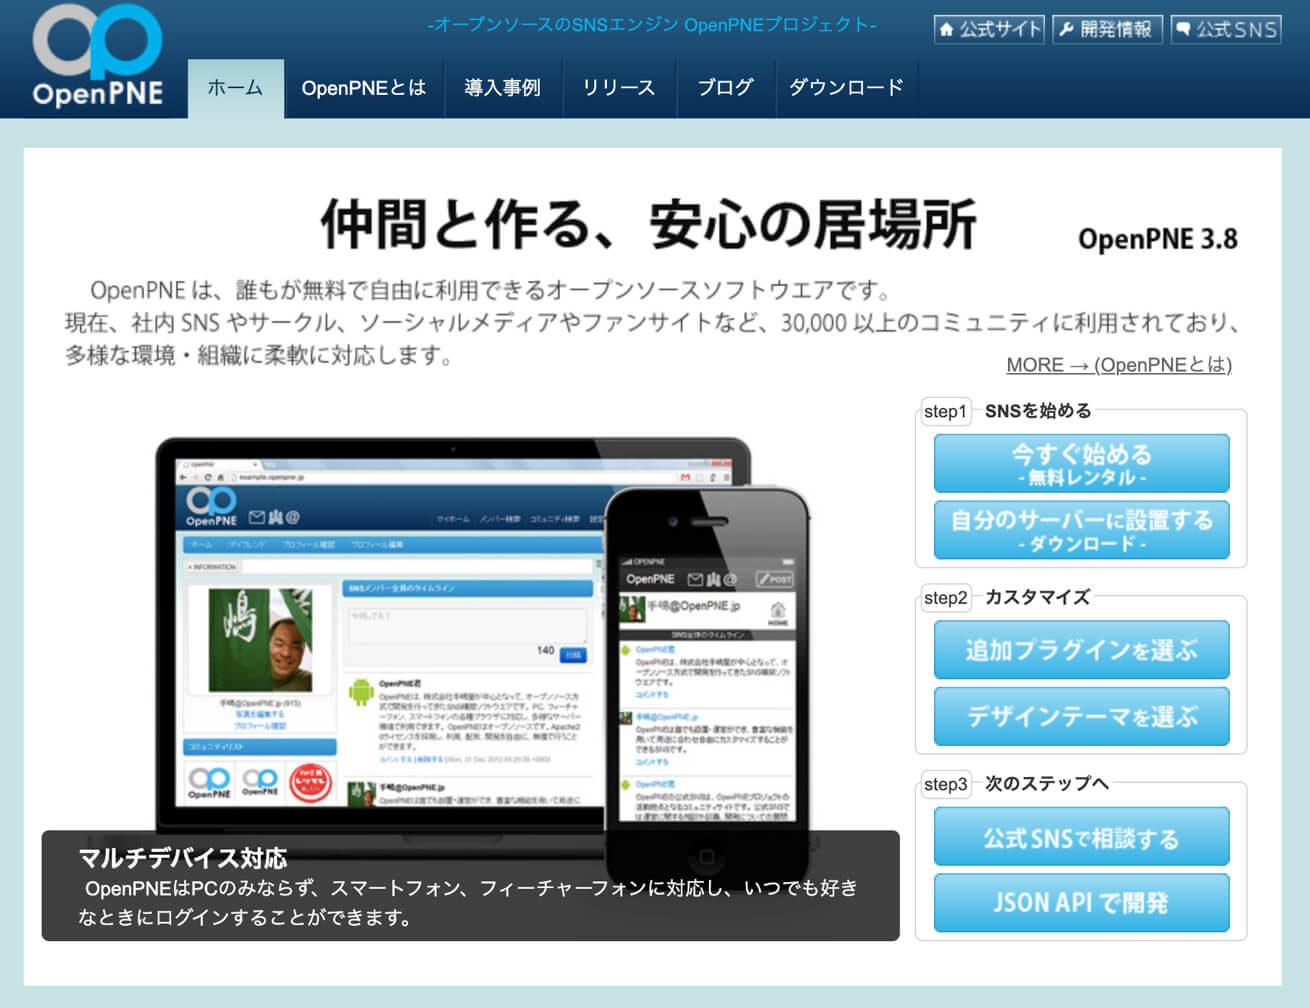 OpenPNEのHPトップ画像